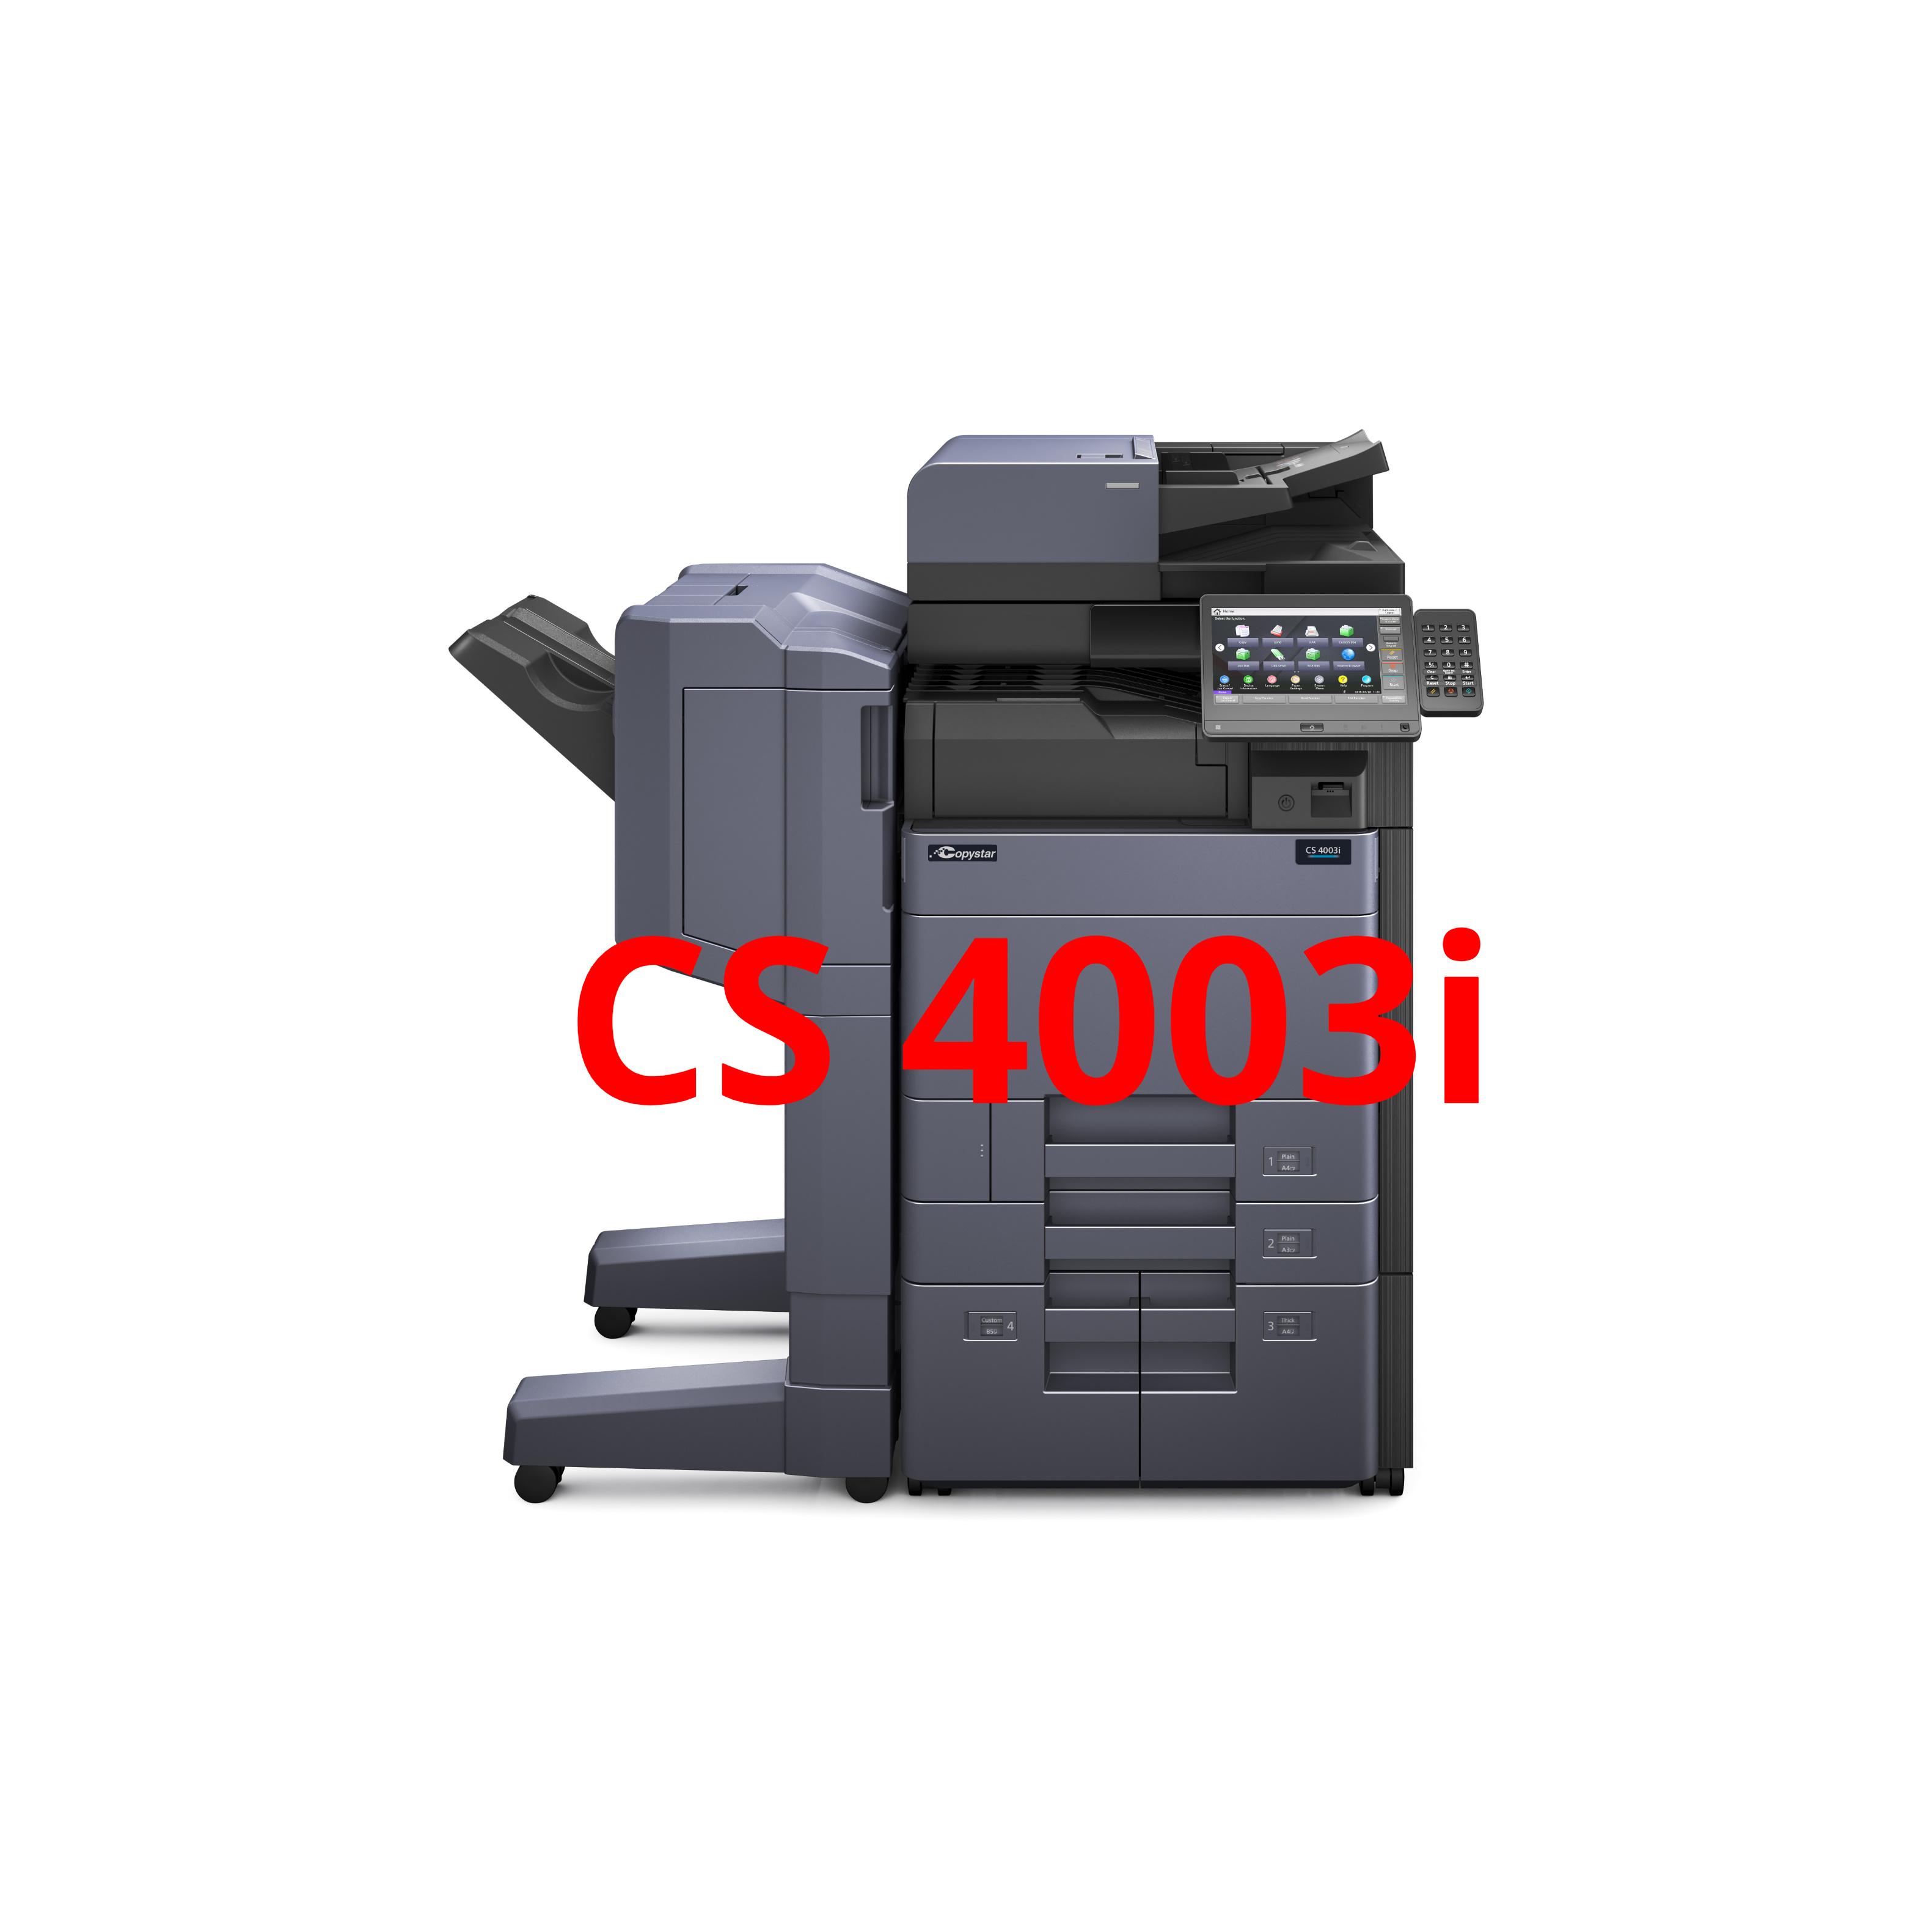 https://0201.nccdn.net/1_2/000/000/135/21e/CS_4003i_Image4-3162x3162.jpg